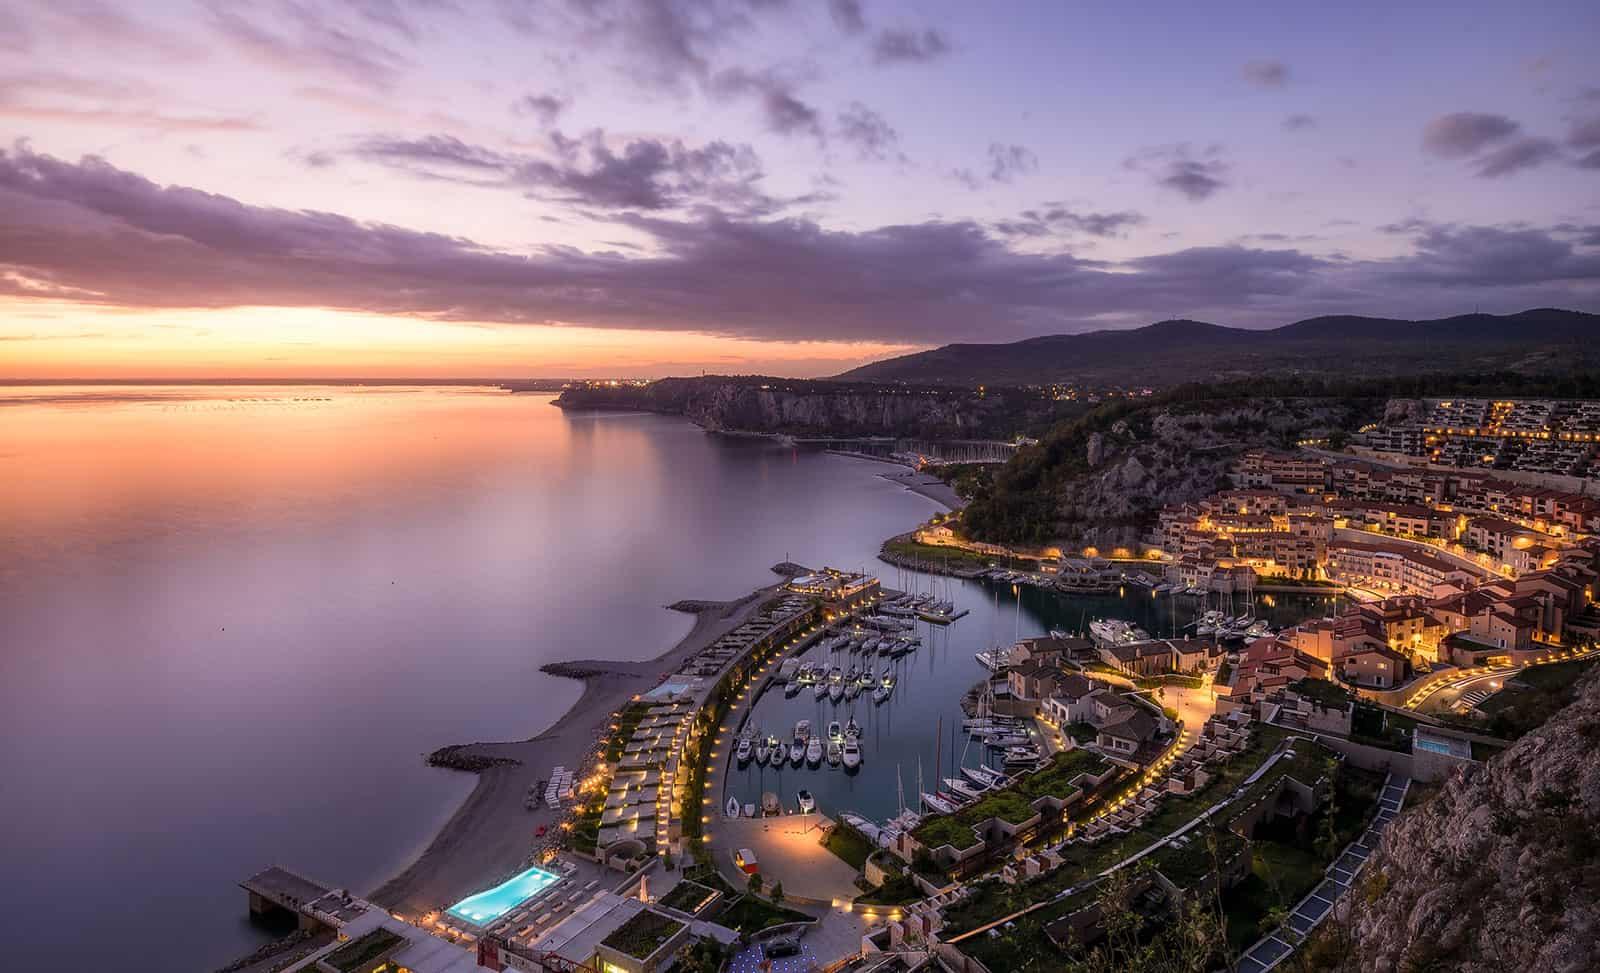 Trieste - © Vaghis - viaggi & turismo-Italia - Tutti-i-diritti-riservati